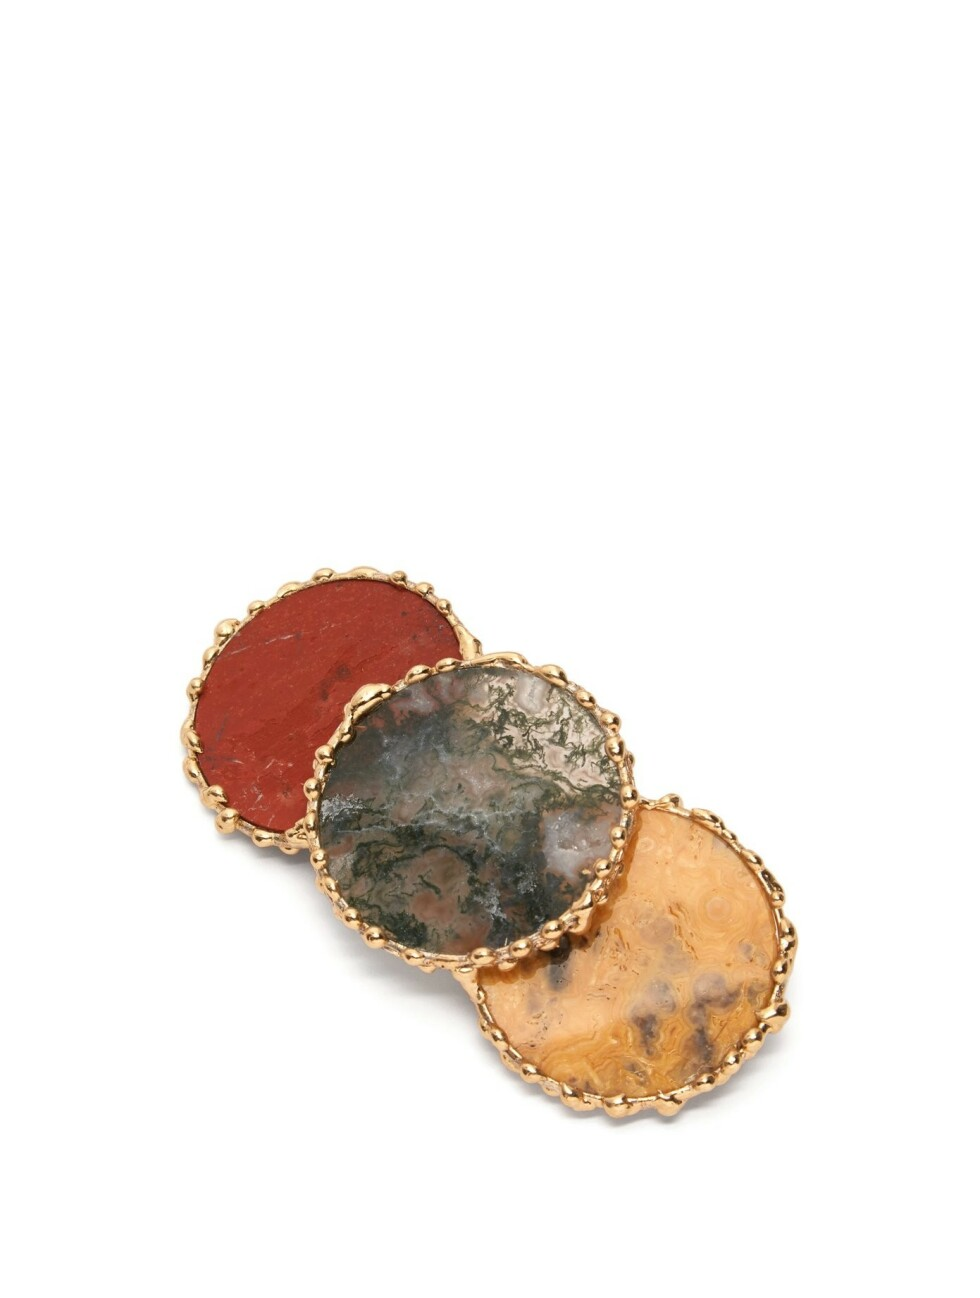 Fargerik spenne fra Rosantica by Michela Panero |1935,-| https://www.matchesfashion.com/intl/products/Rosantica-By-Michela-Panero-Wallace-agate-hair-clip-1271247